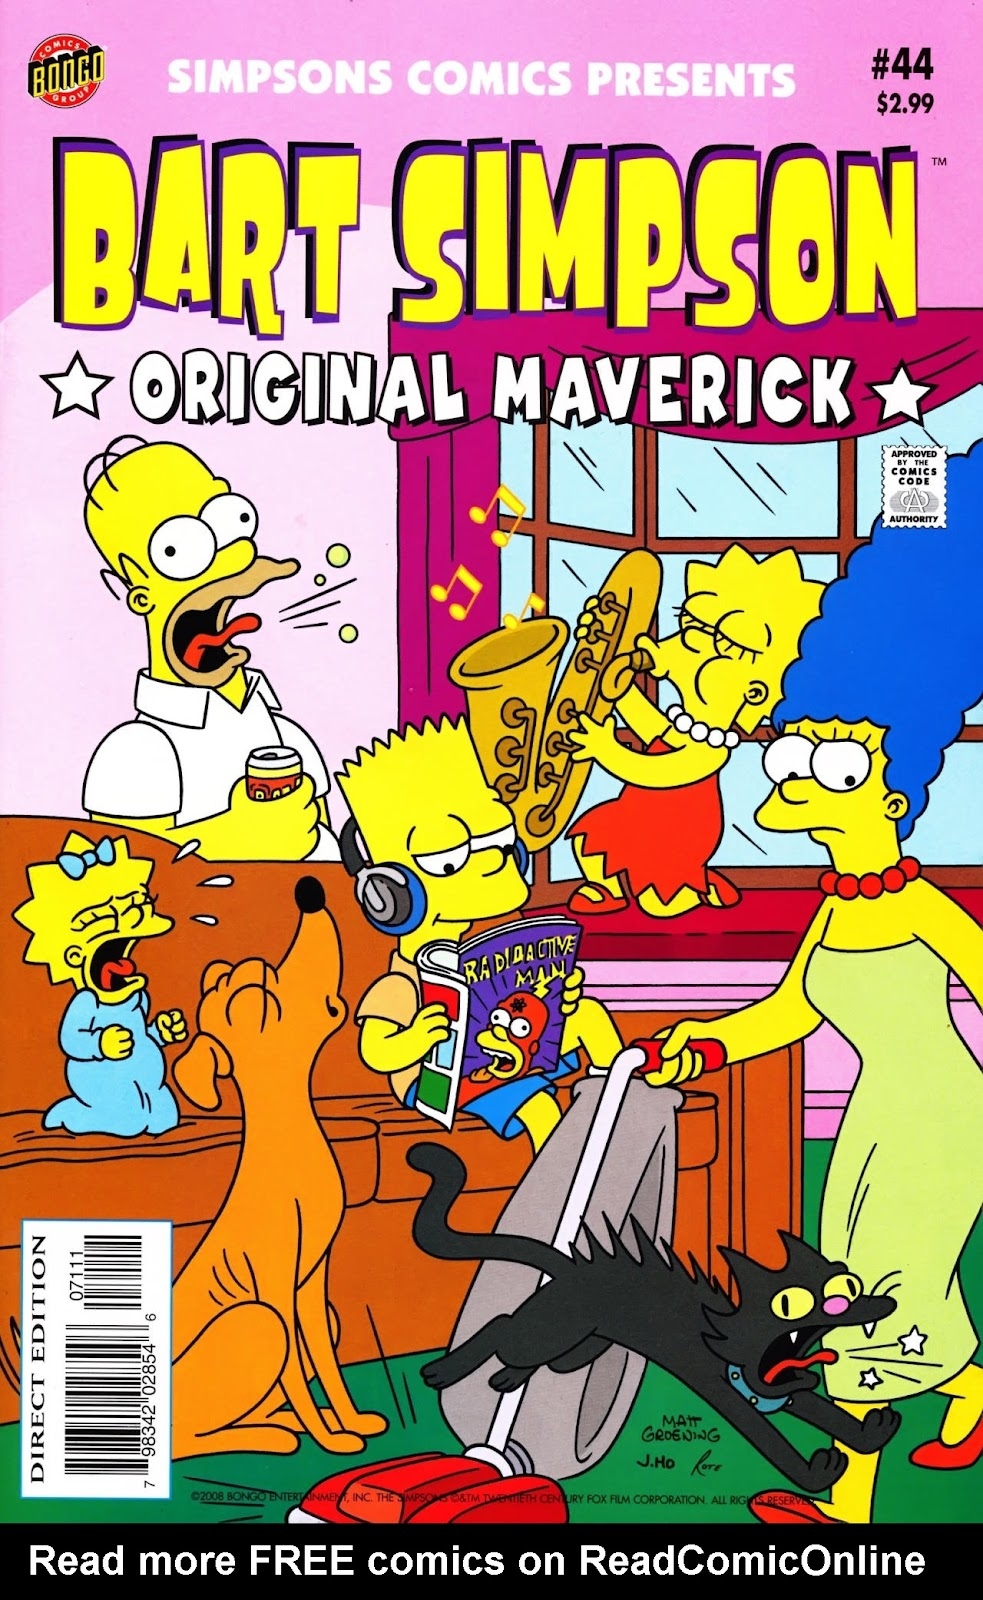 Simpsons Comics Presents Bart Simpson 44 Page 1